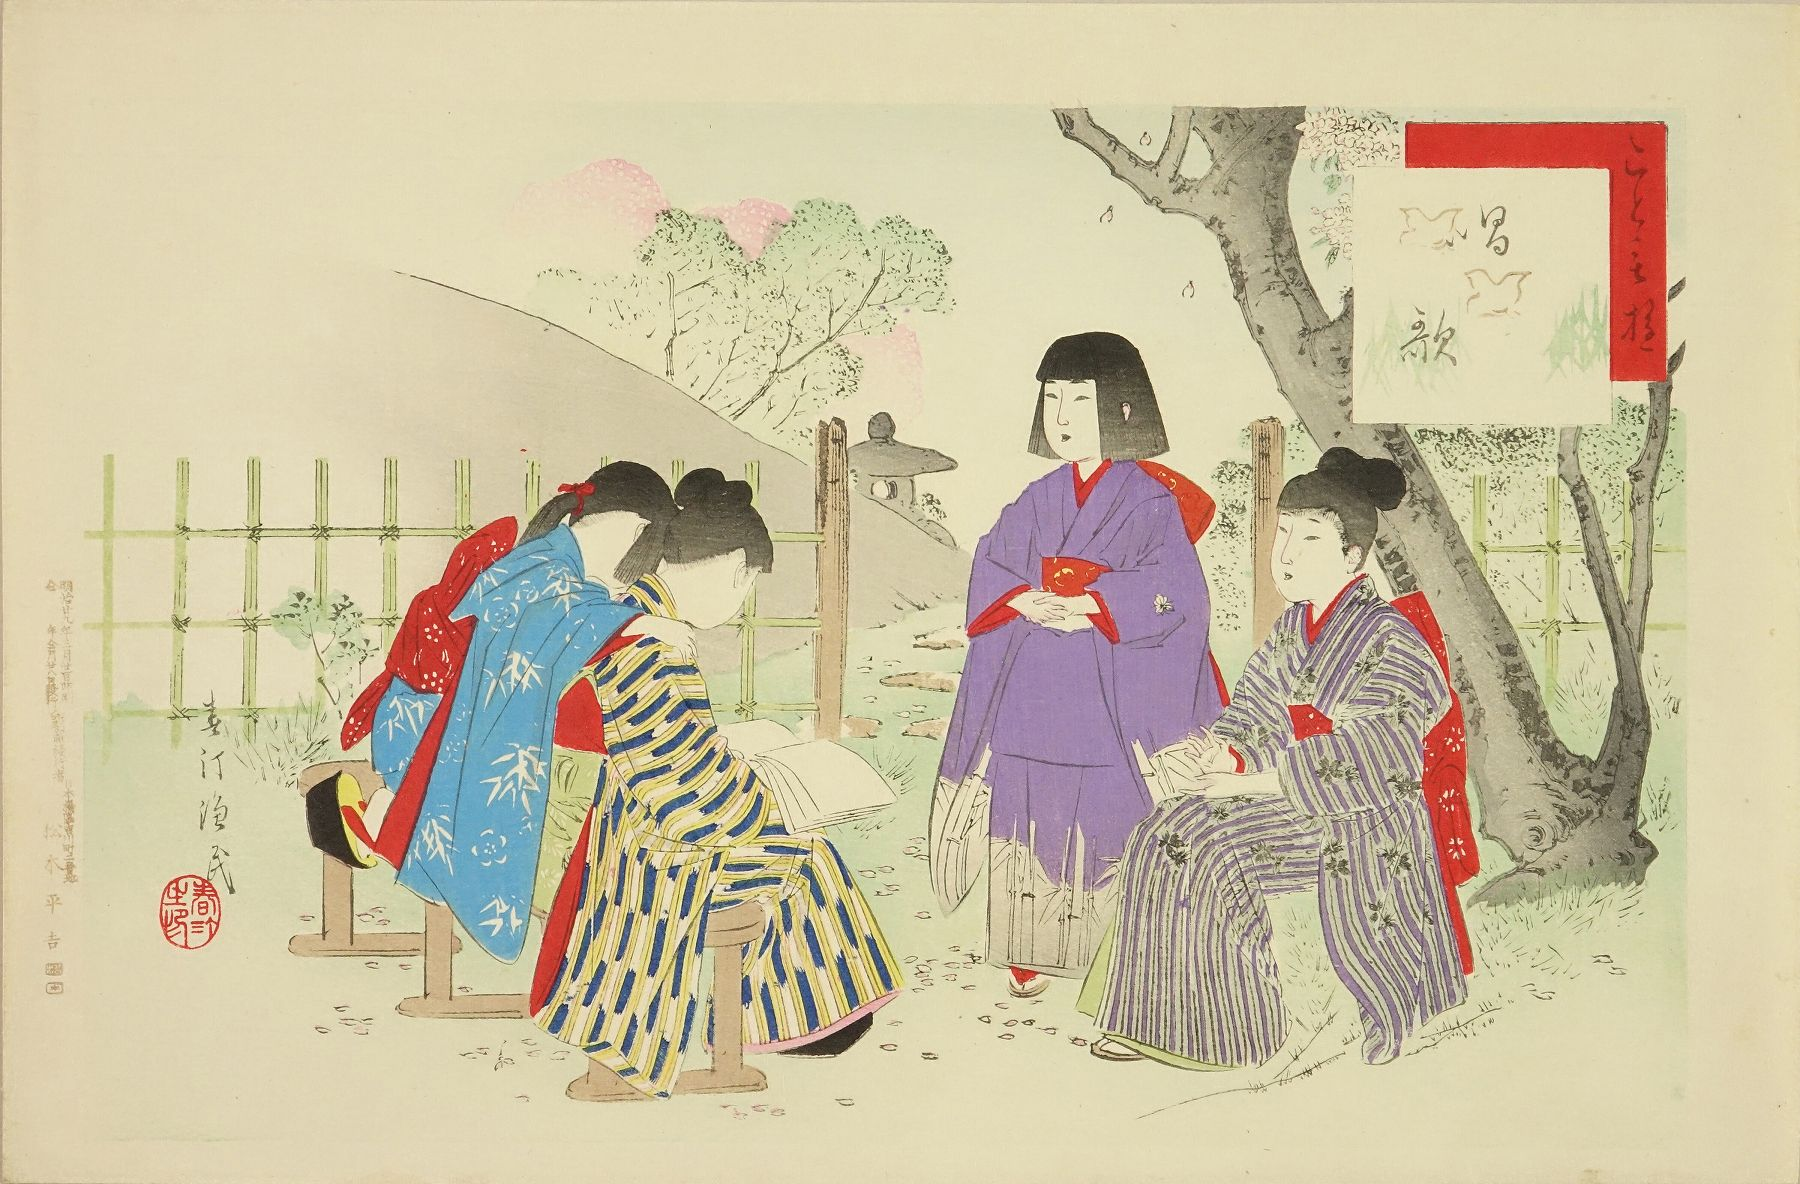 SHUNTEI <i>Shoka</i> (Singing), from <i>Kodomo asobi</i> (Children's play)